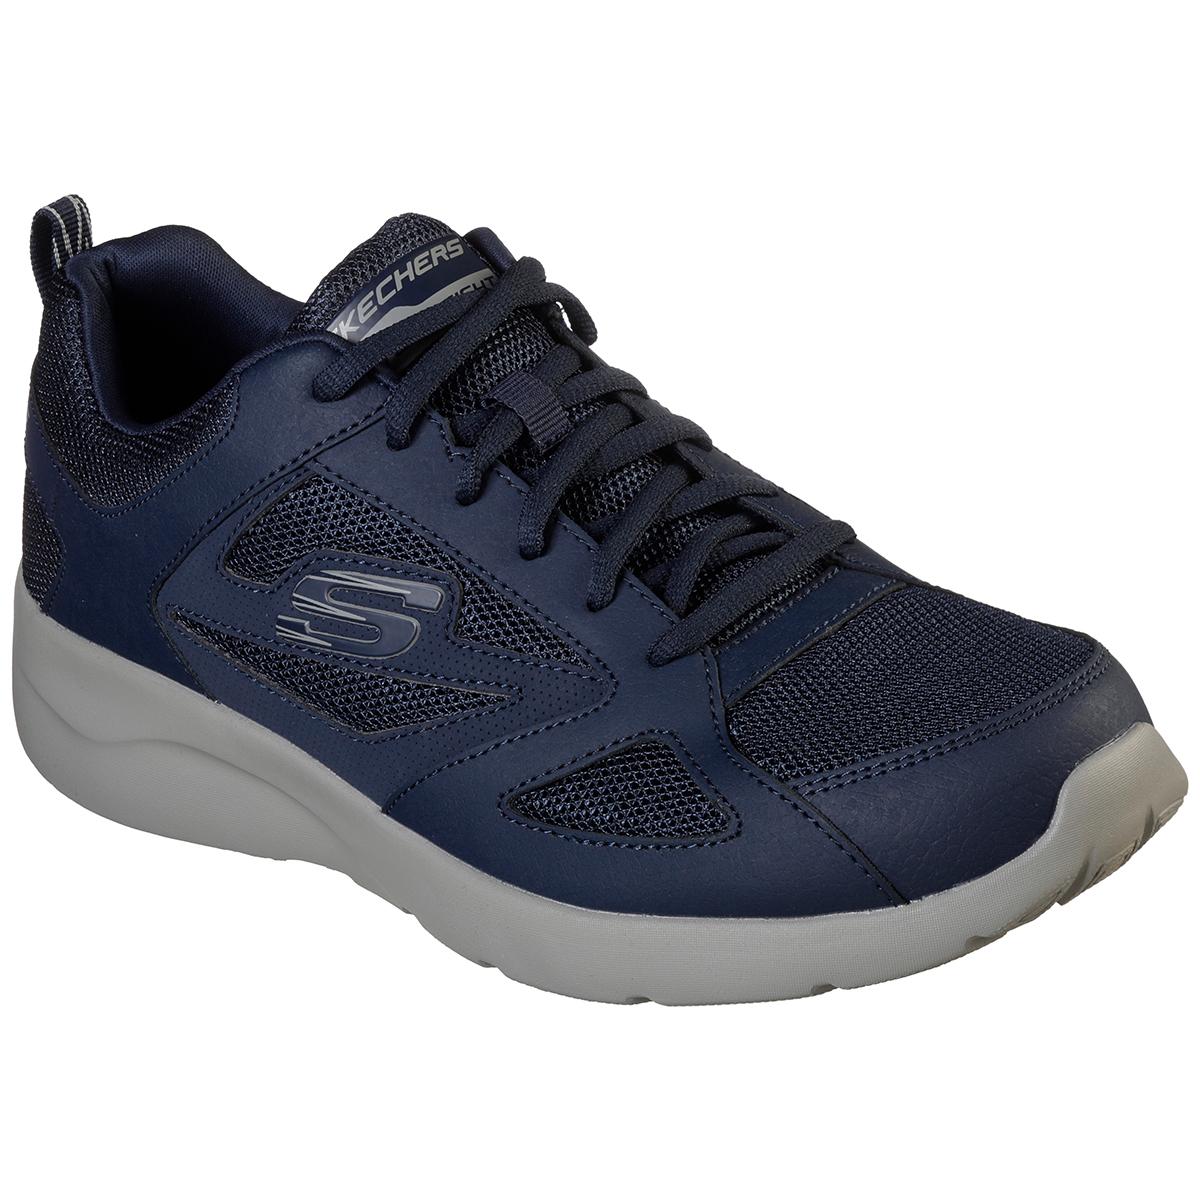 Skechers Men's Shoes | Costco Australia